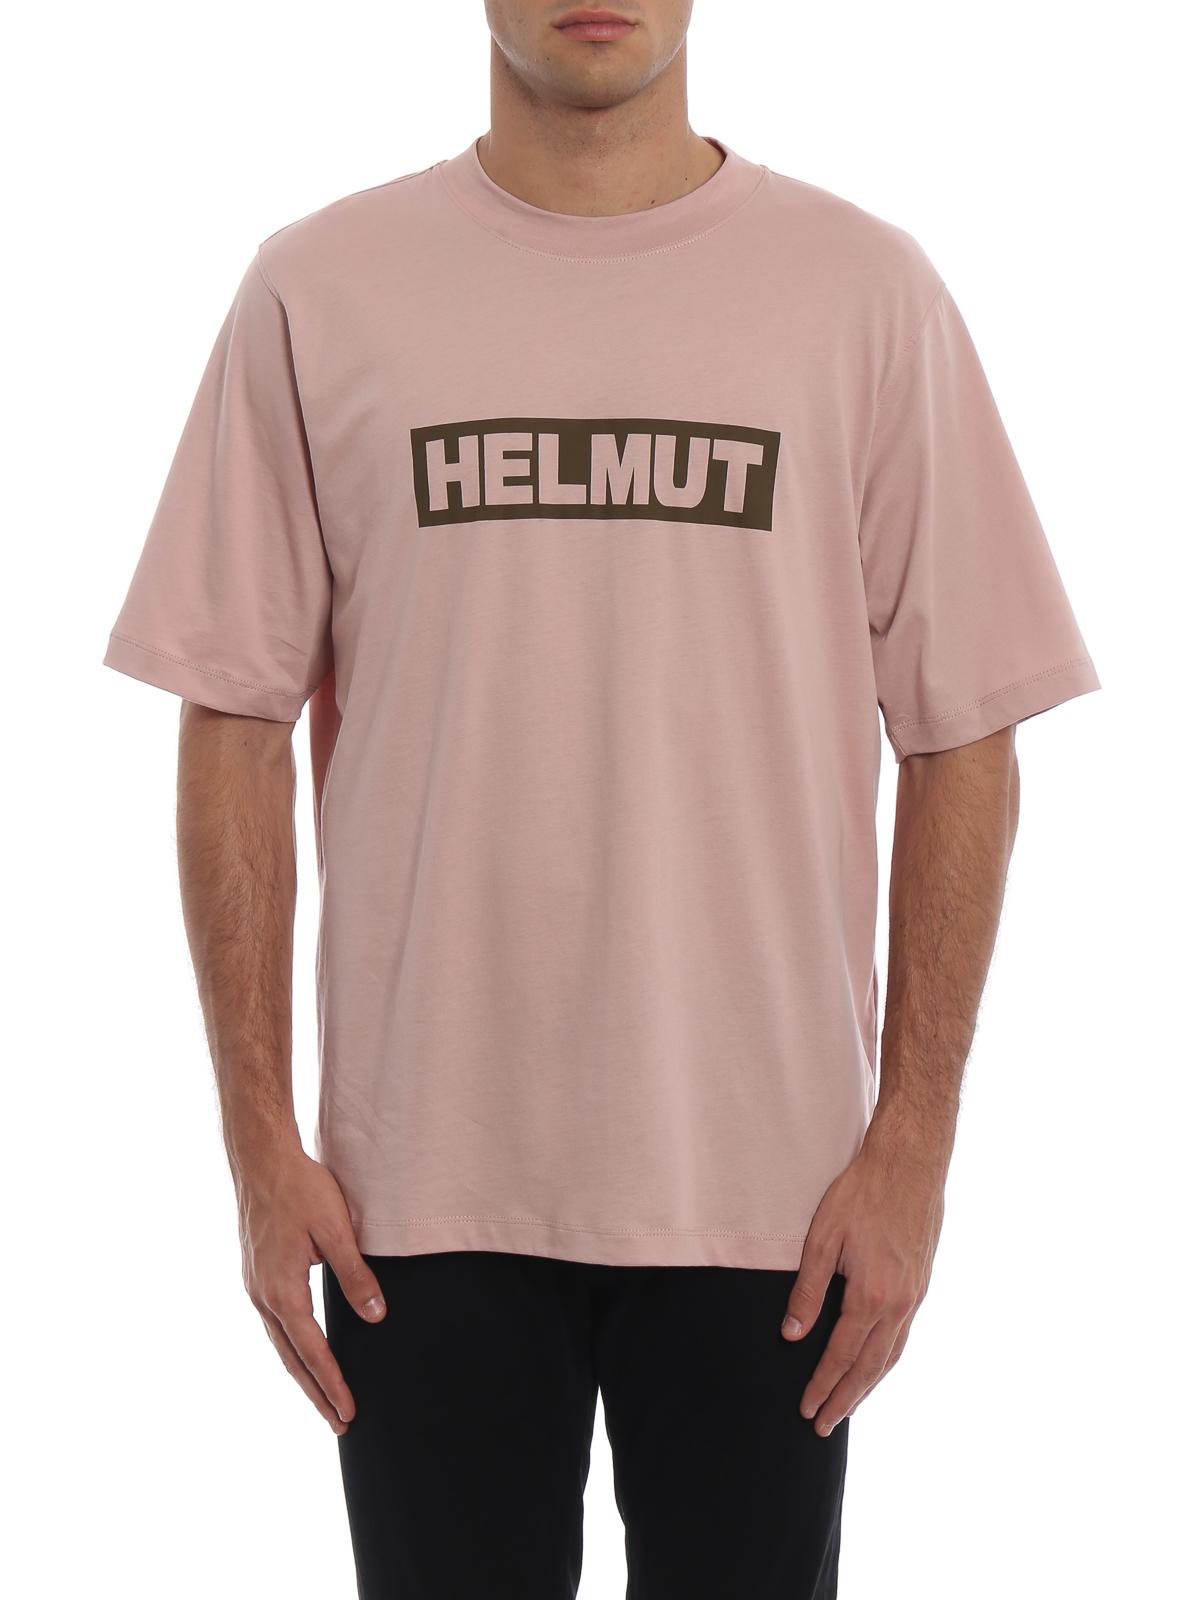 Mujer · Hombre. iKRIX HELMUT LANG  Camisetas - Camiseta - Rosado 3f4e9b153bdcd